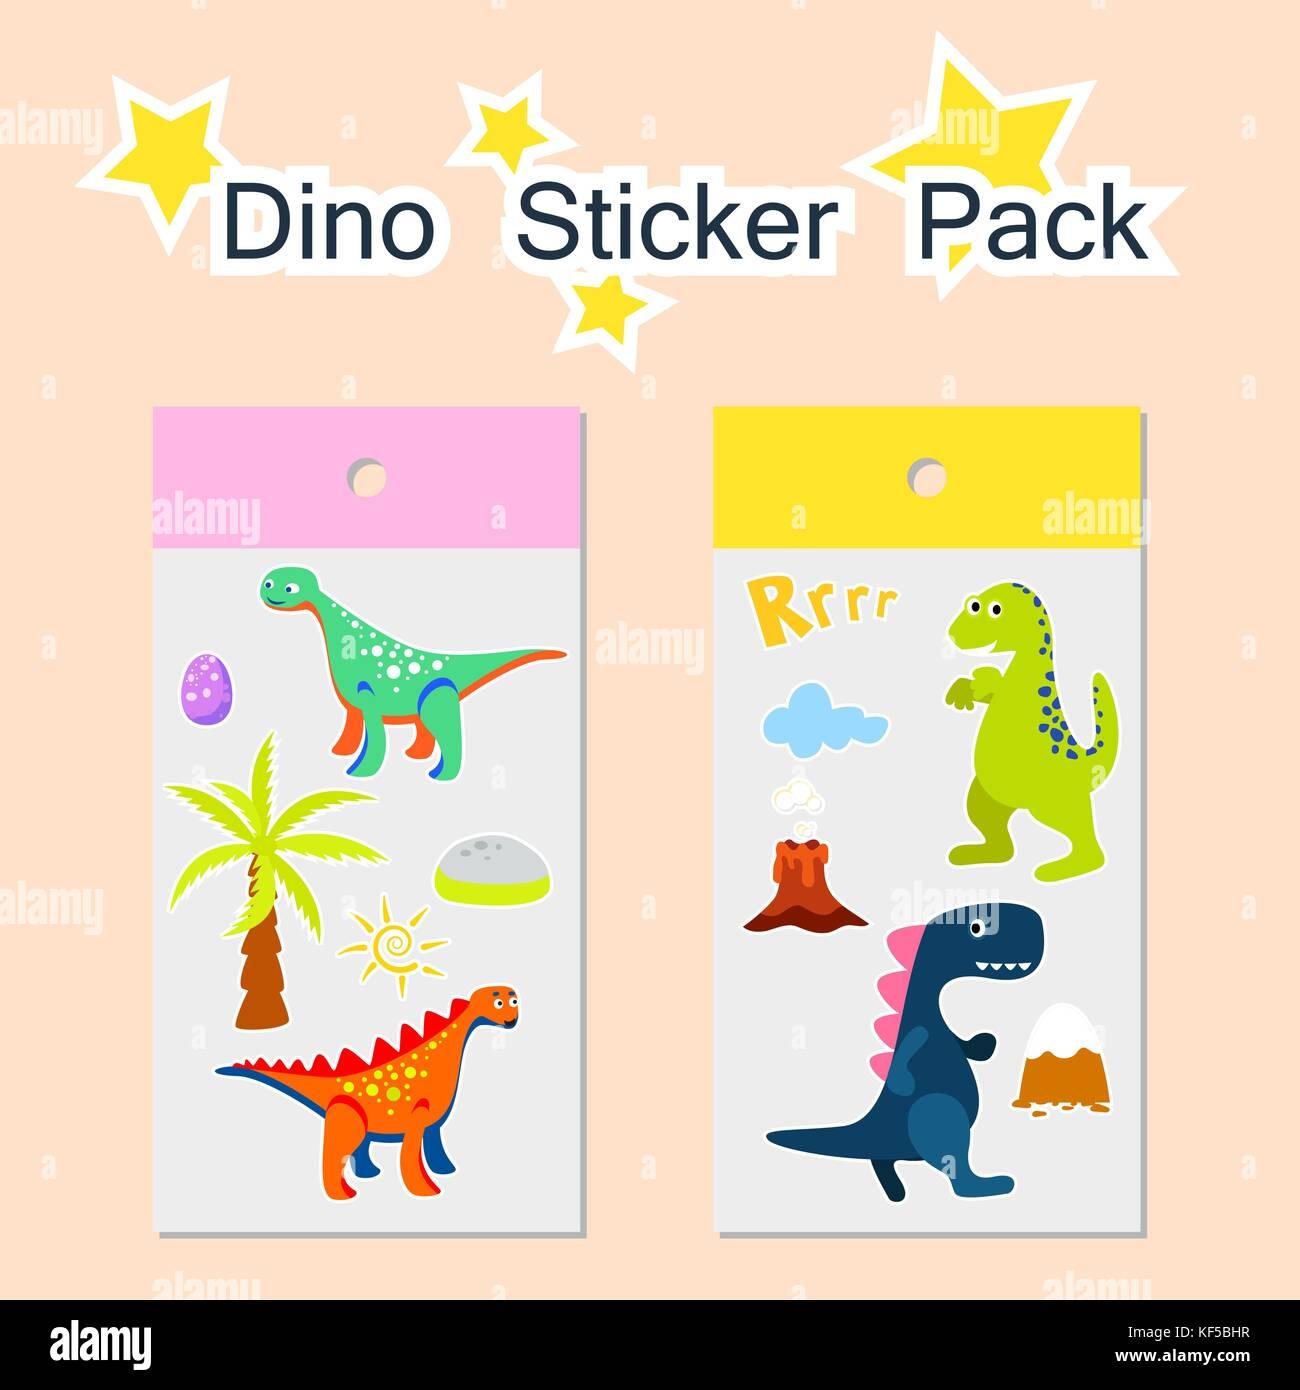 Dino sticker pack vector illustration. - Stock Image